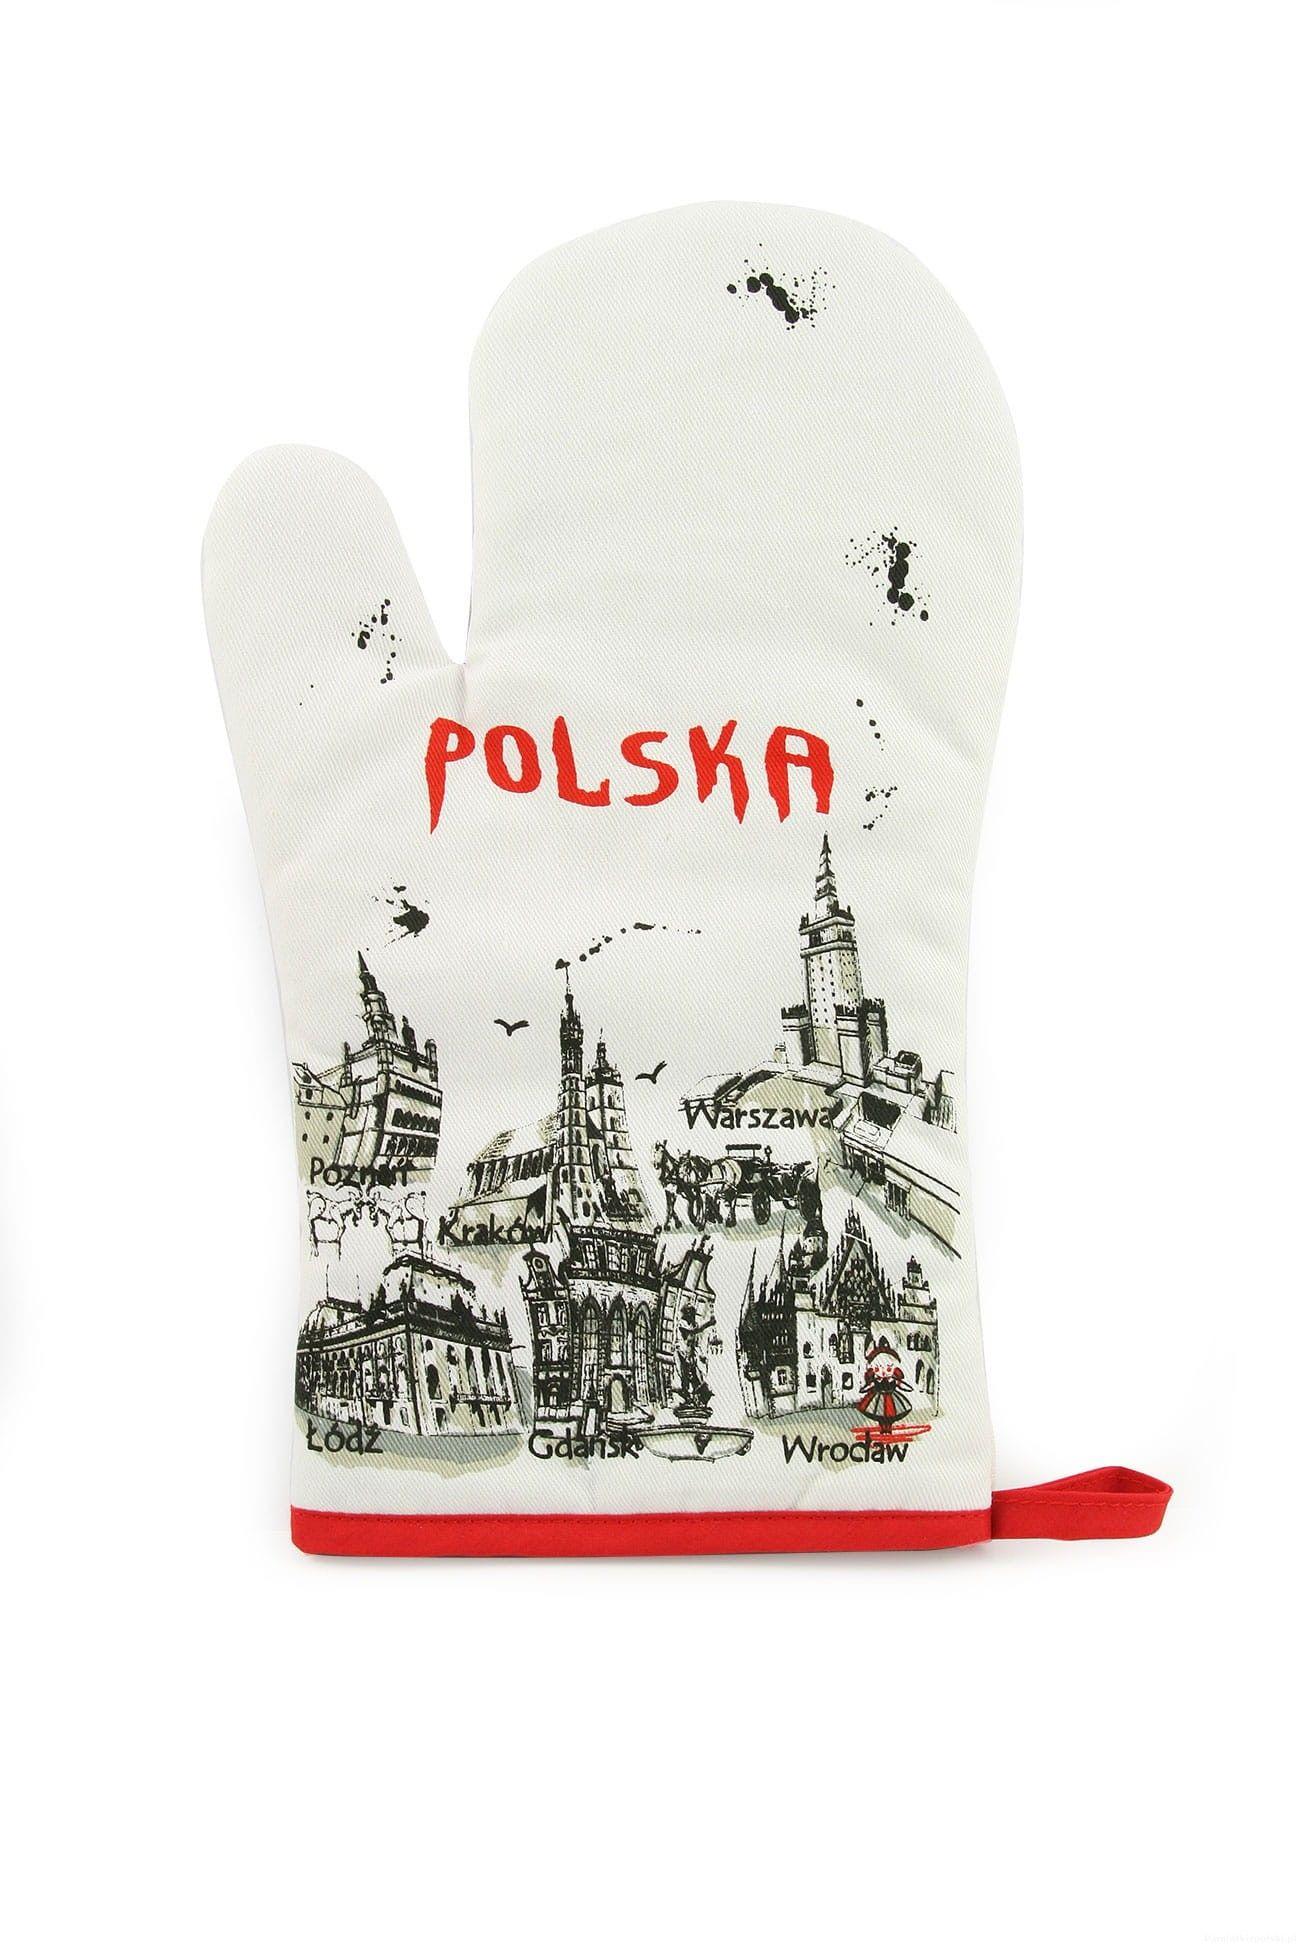 Rękawica kuchenna Polska farba